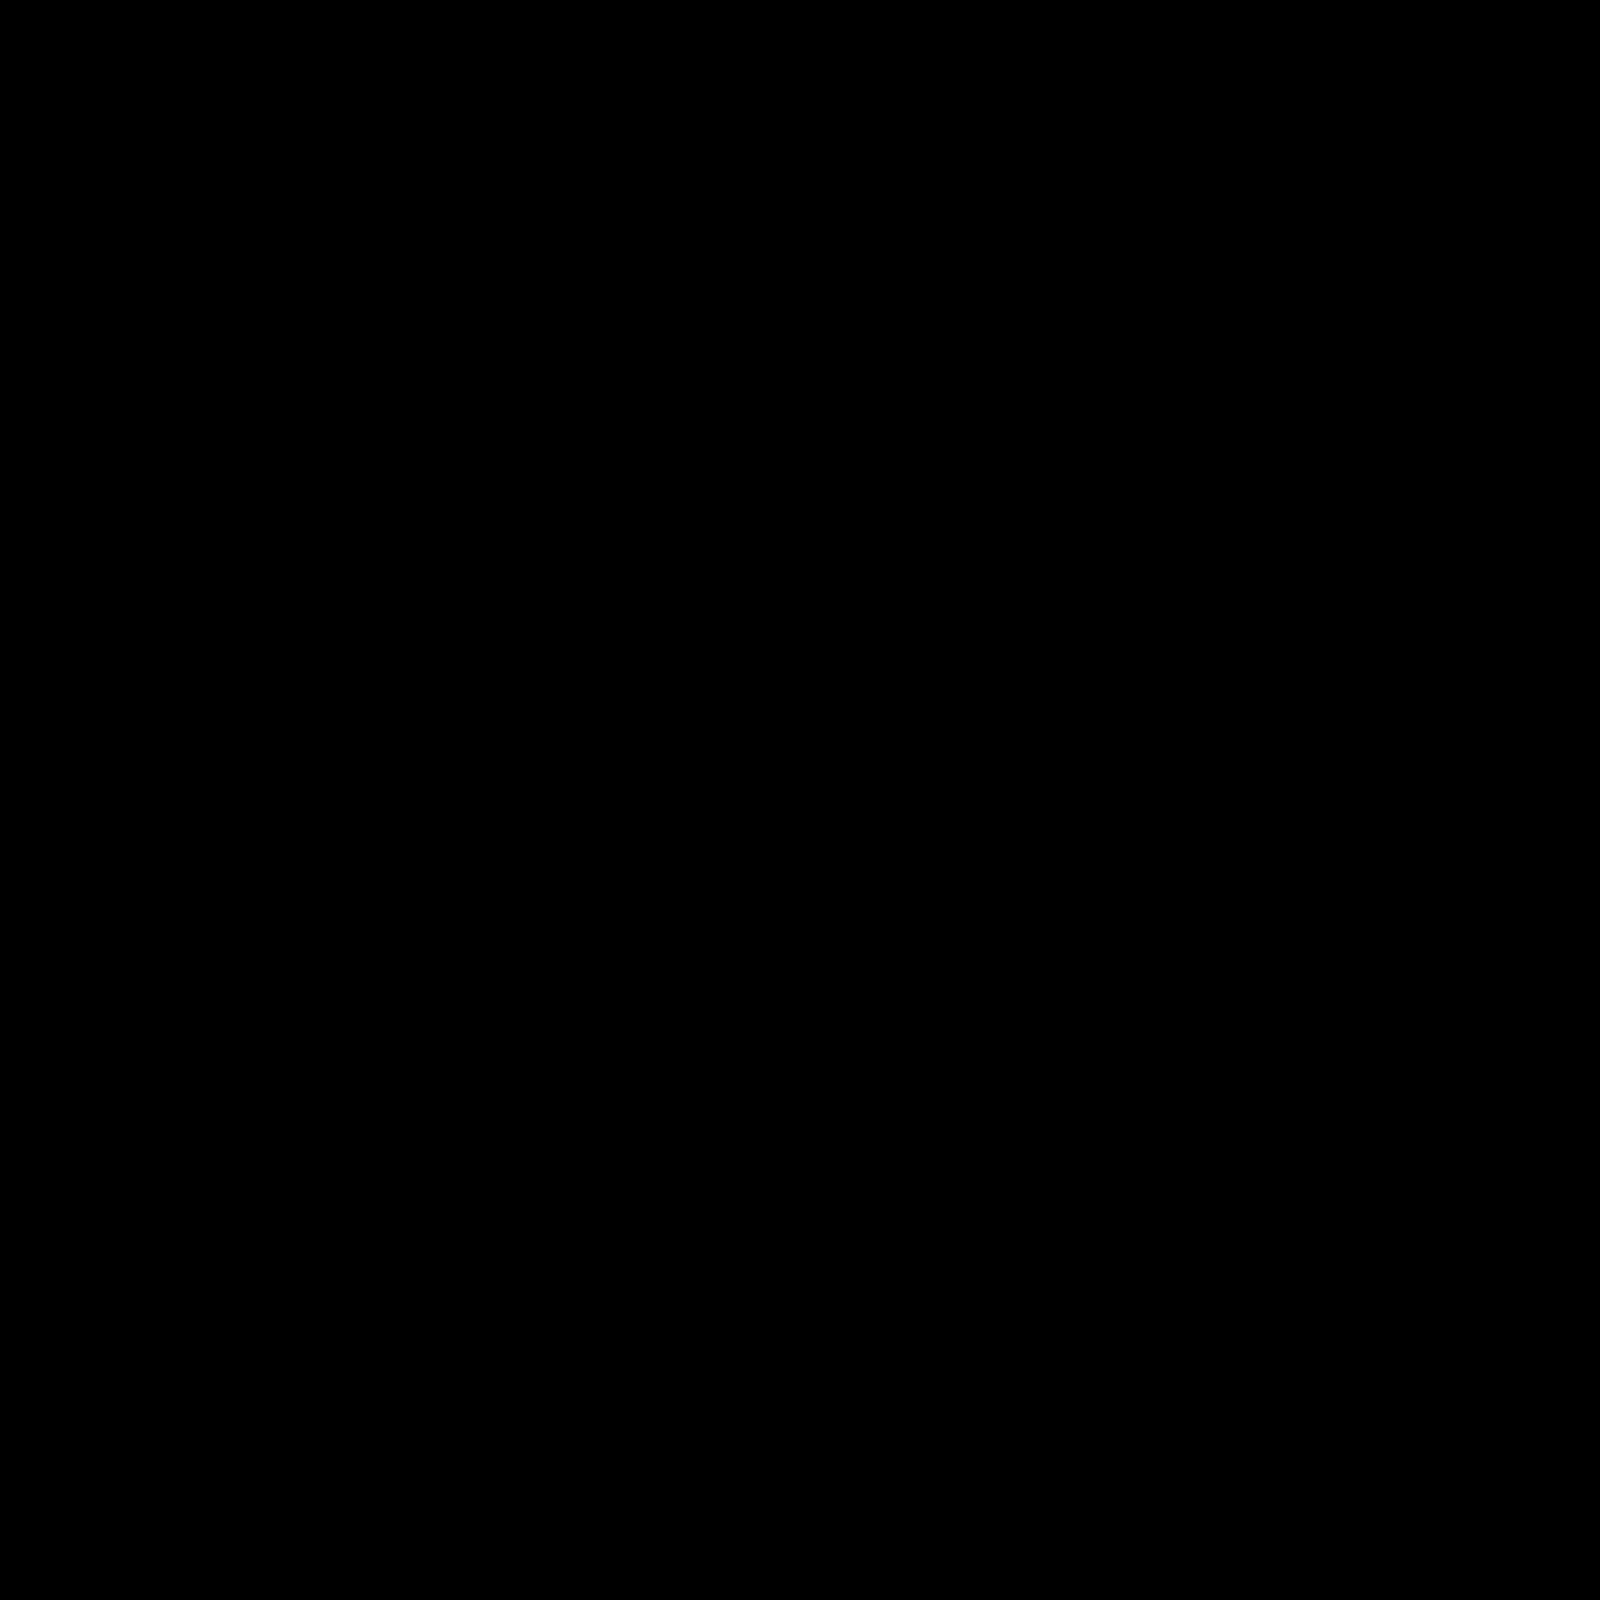 1 08 icon